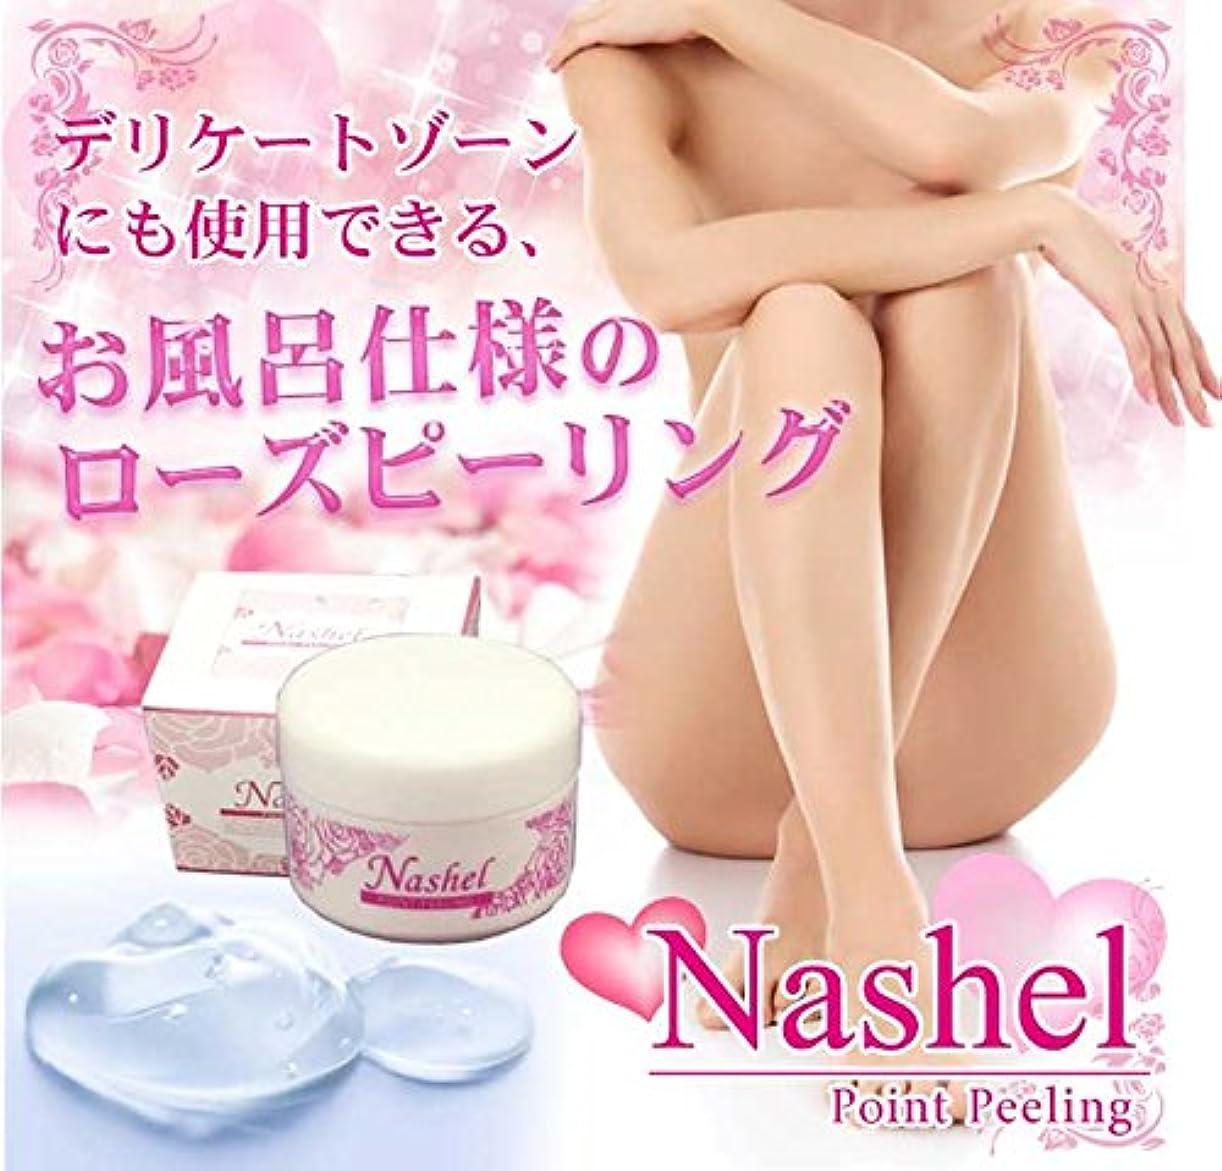 Nashel point peeling(ナシェル ポイントピーリング)